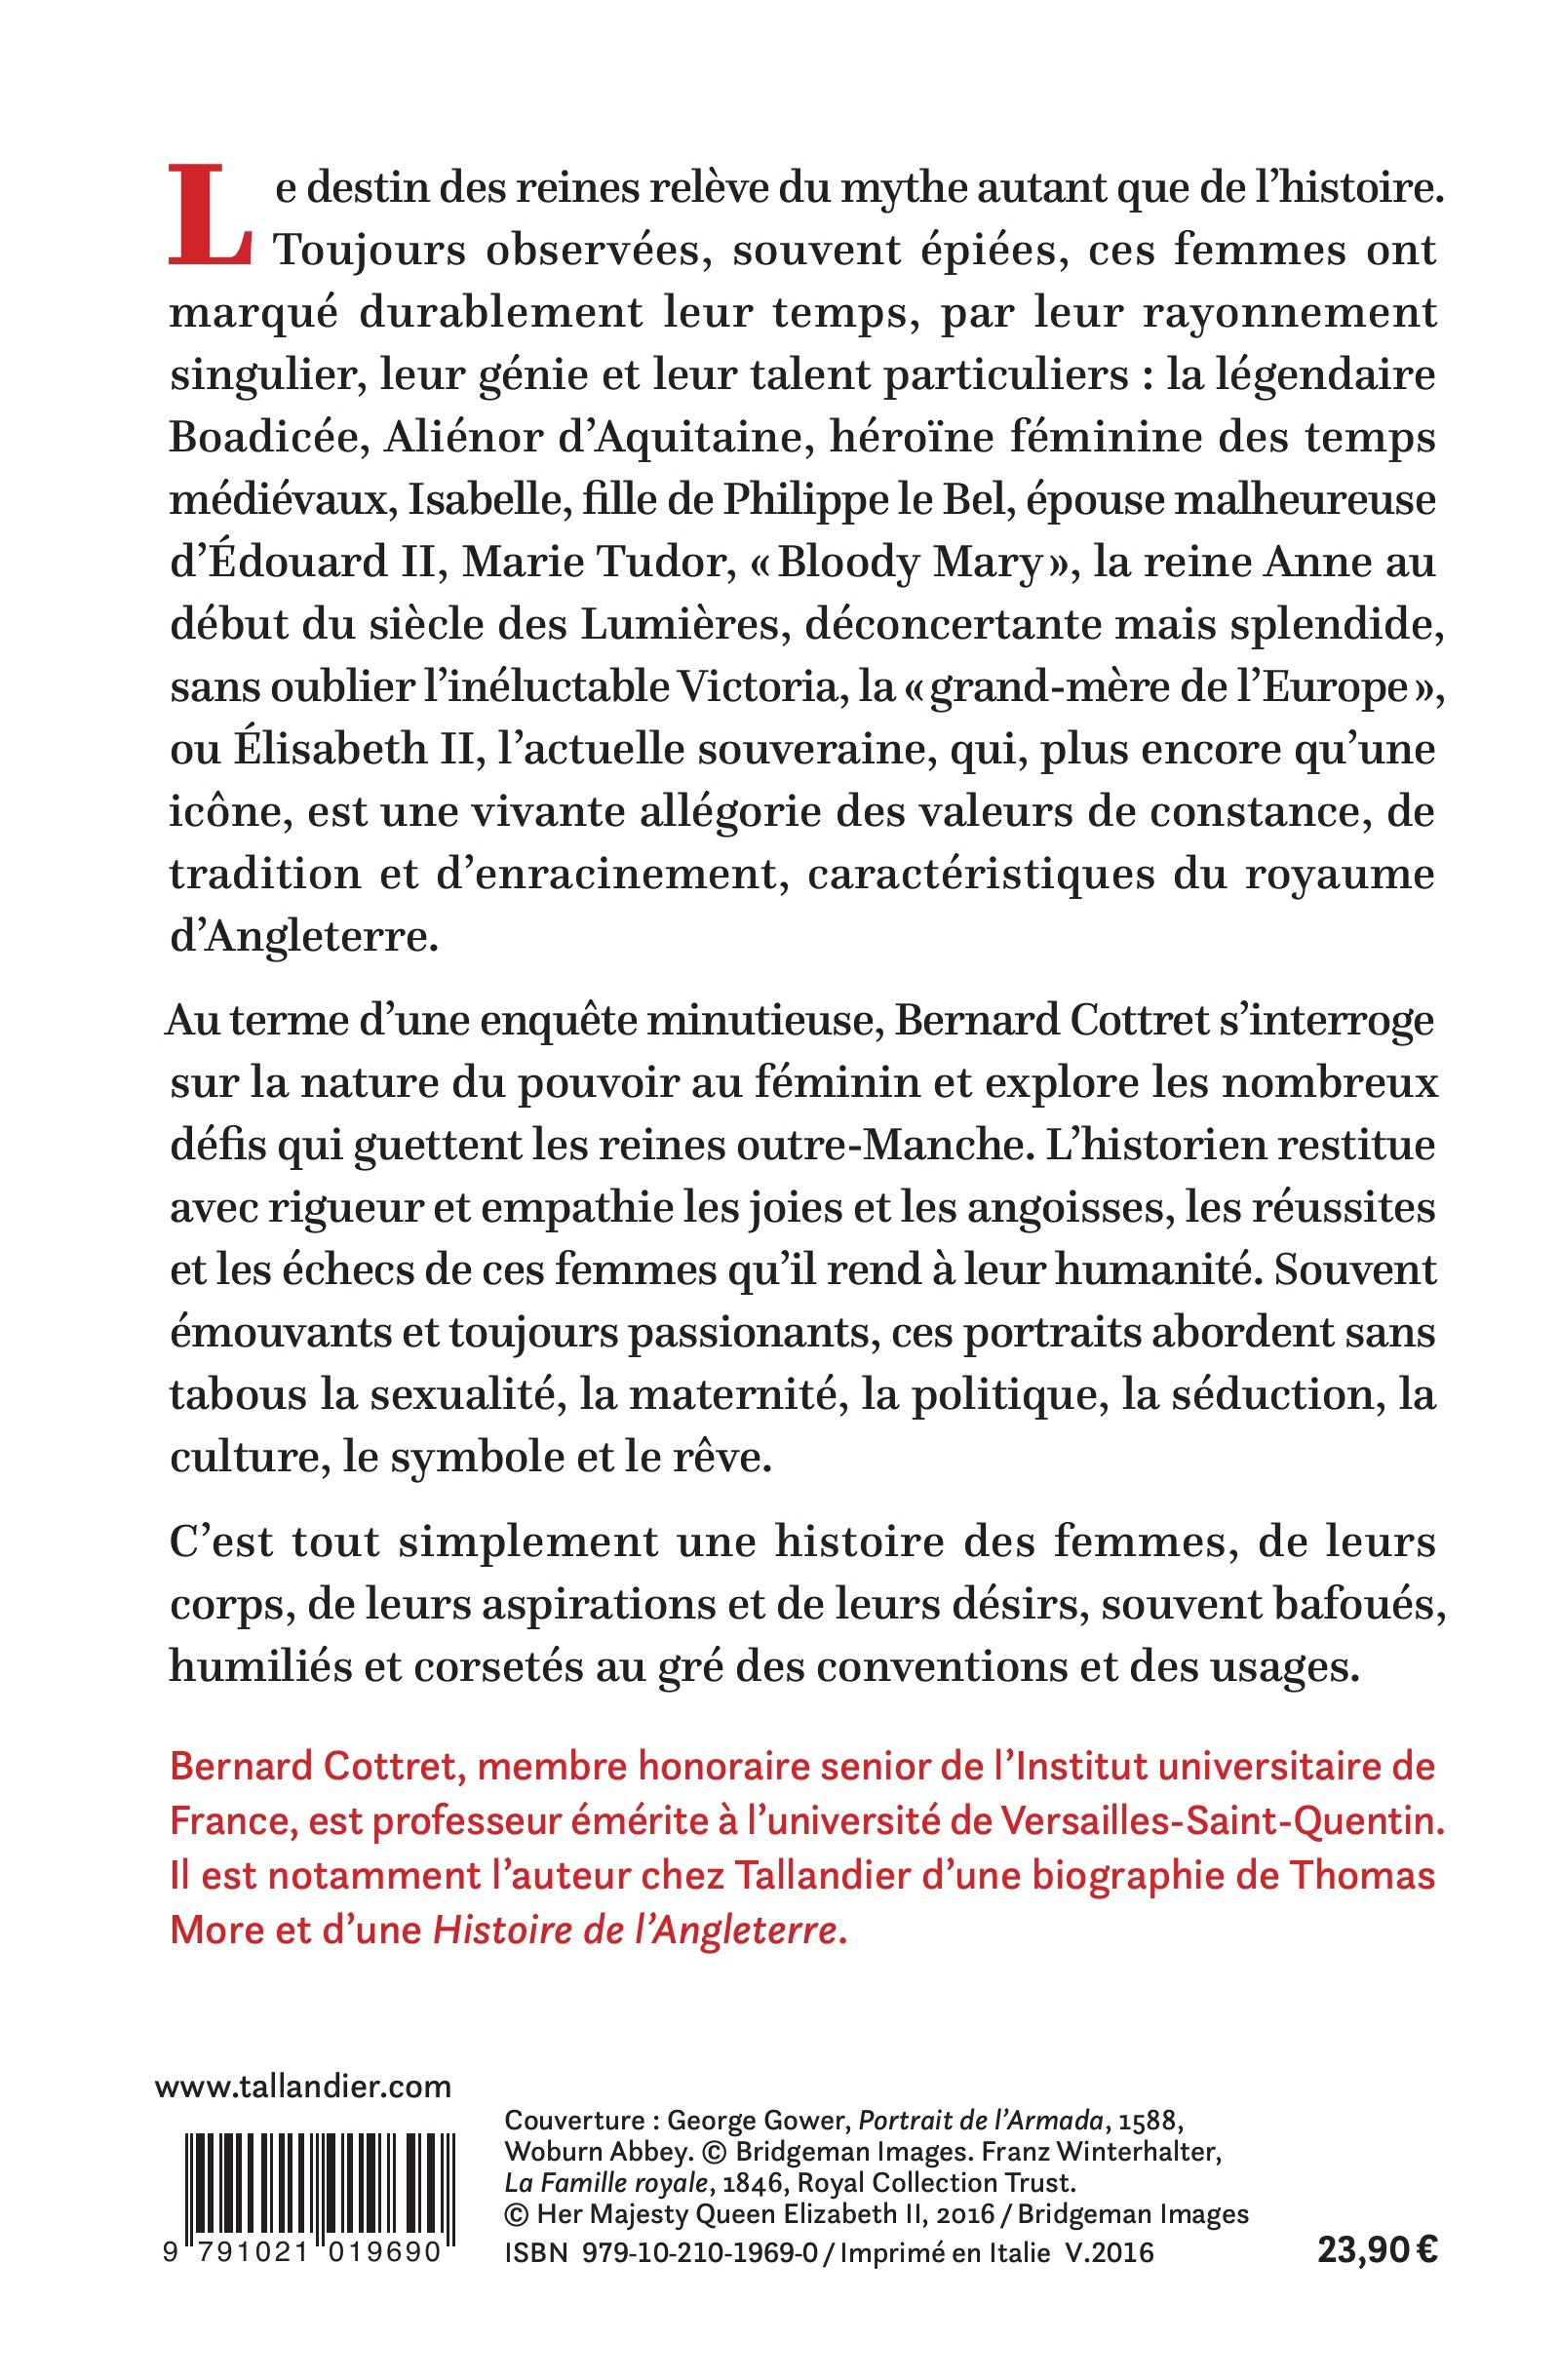 Ces reines qui ont fait l Angleterre de boadicee a elisabeth II: Amazon.es: Bernard Cottret: Libros en idiomas extranjeros